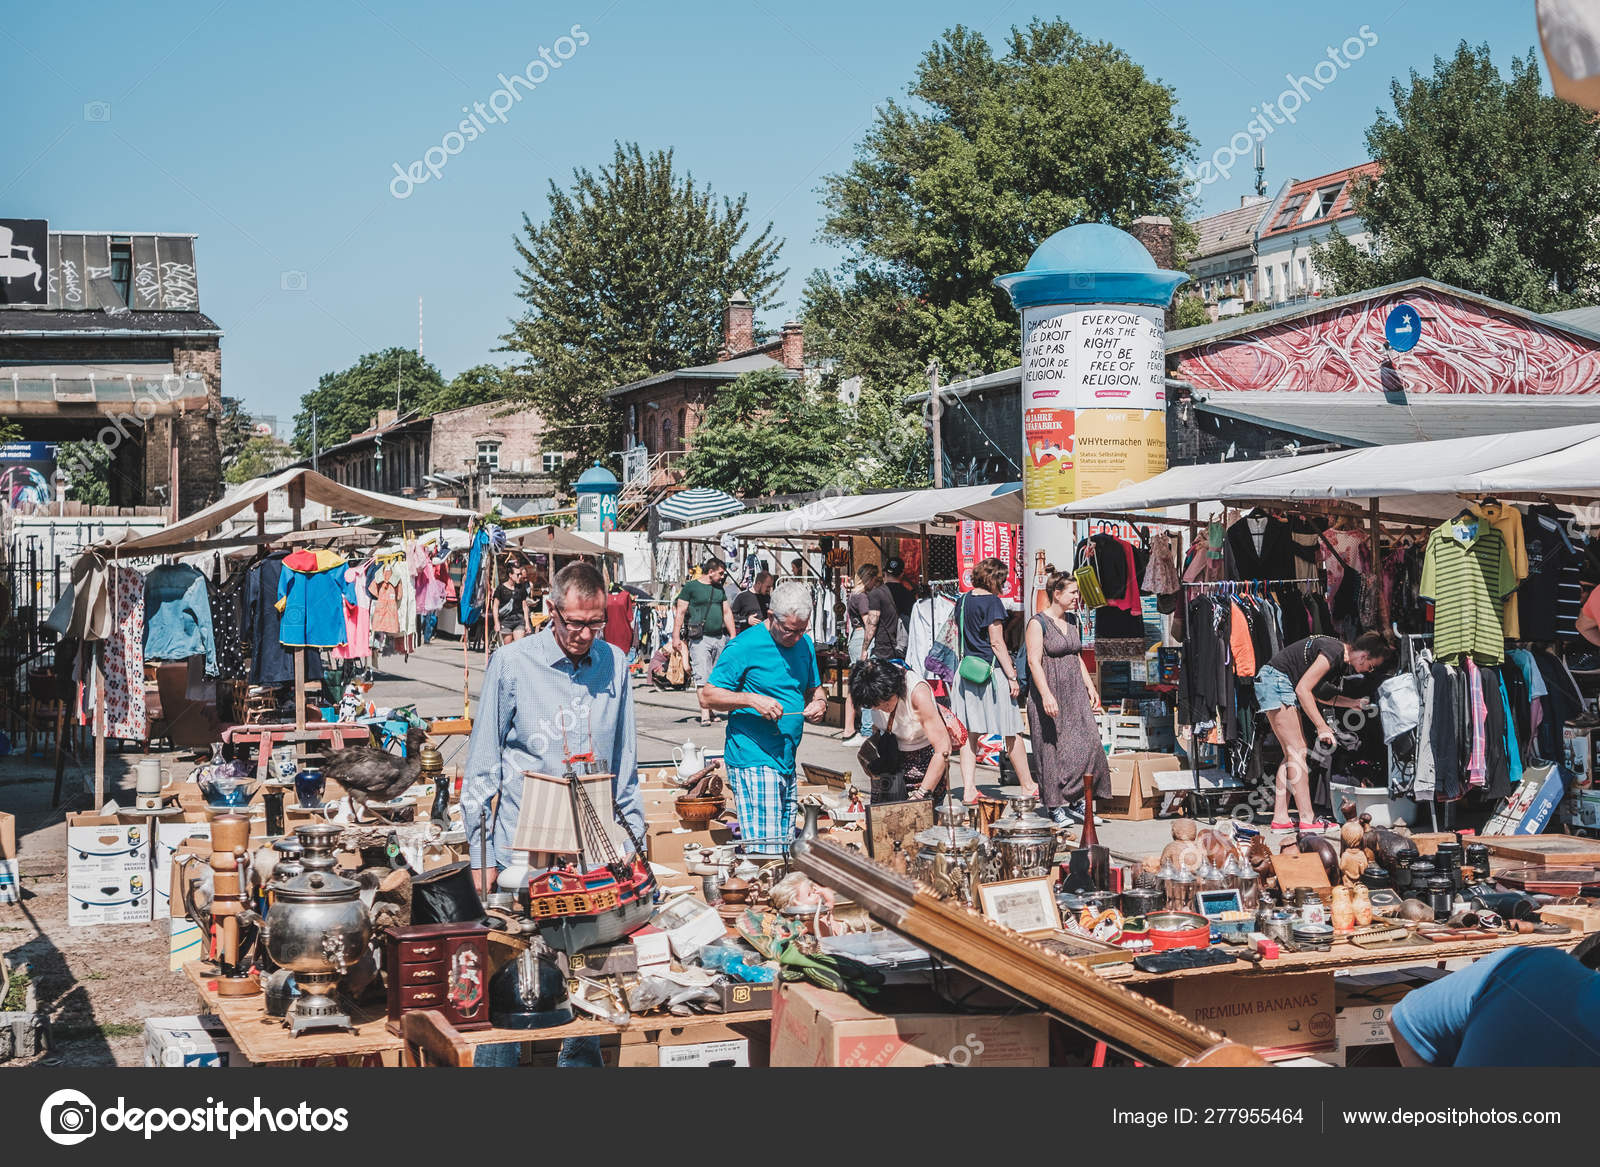 People on Raw flea market on a sunny sunday in Berlin